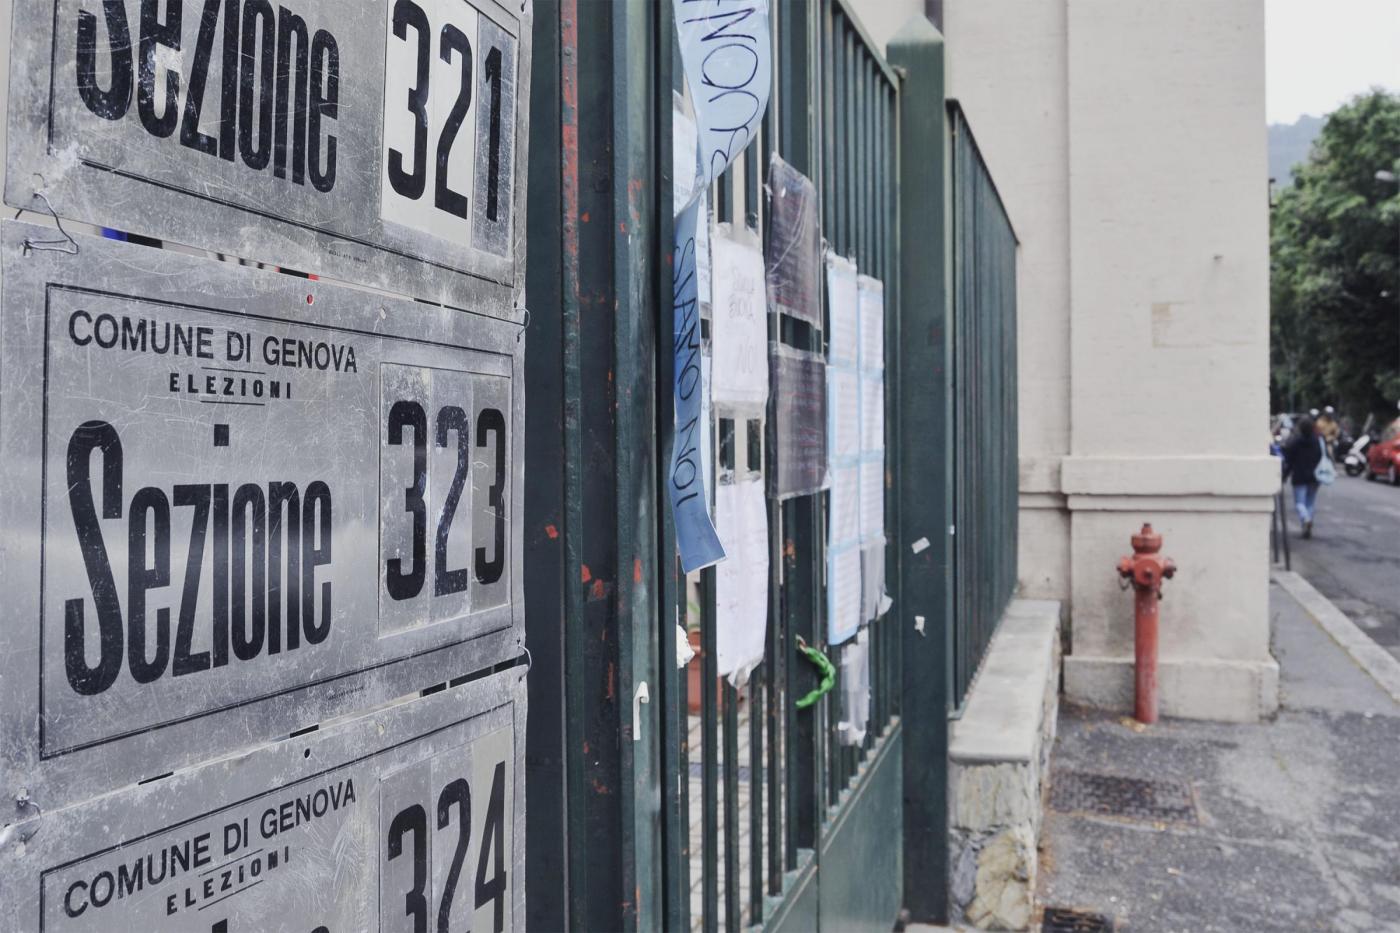 Elezioni amministrative Genova 2017: data, candidati sindaco e sondaggi